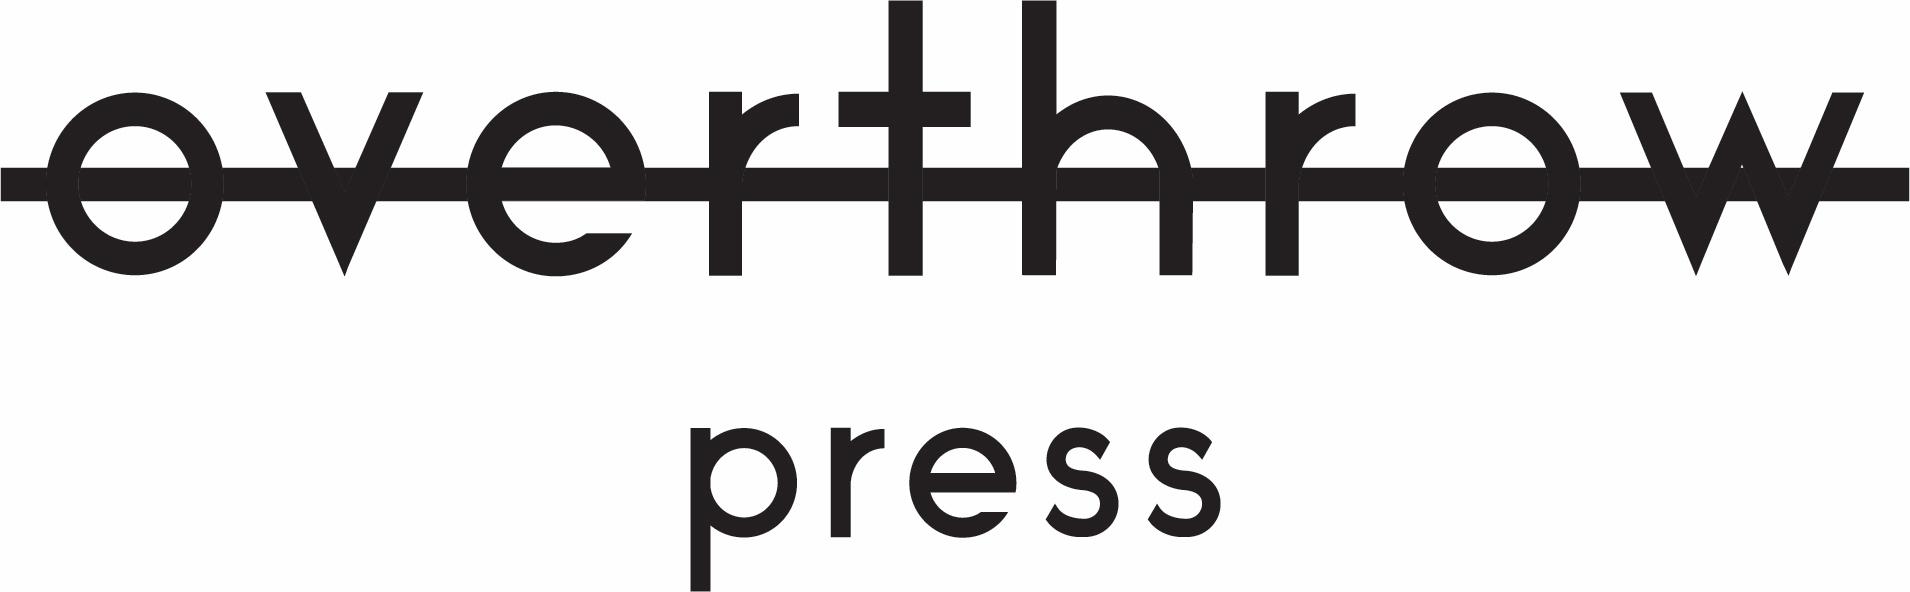 overthrow press (@overthrow) Cover Image